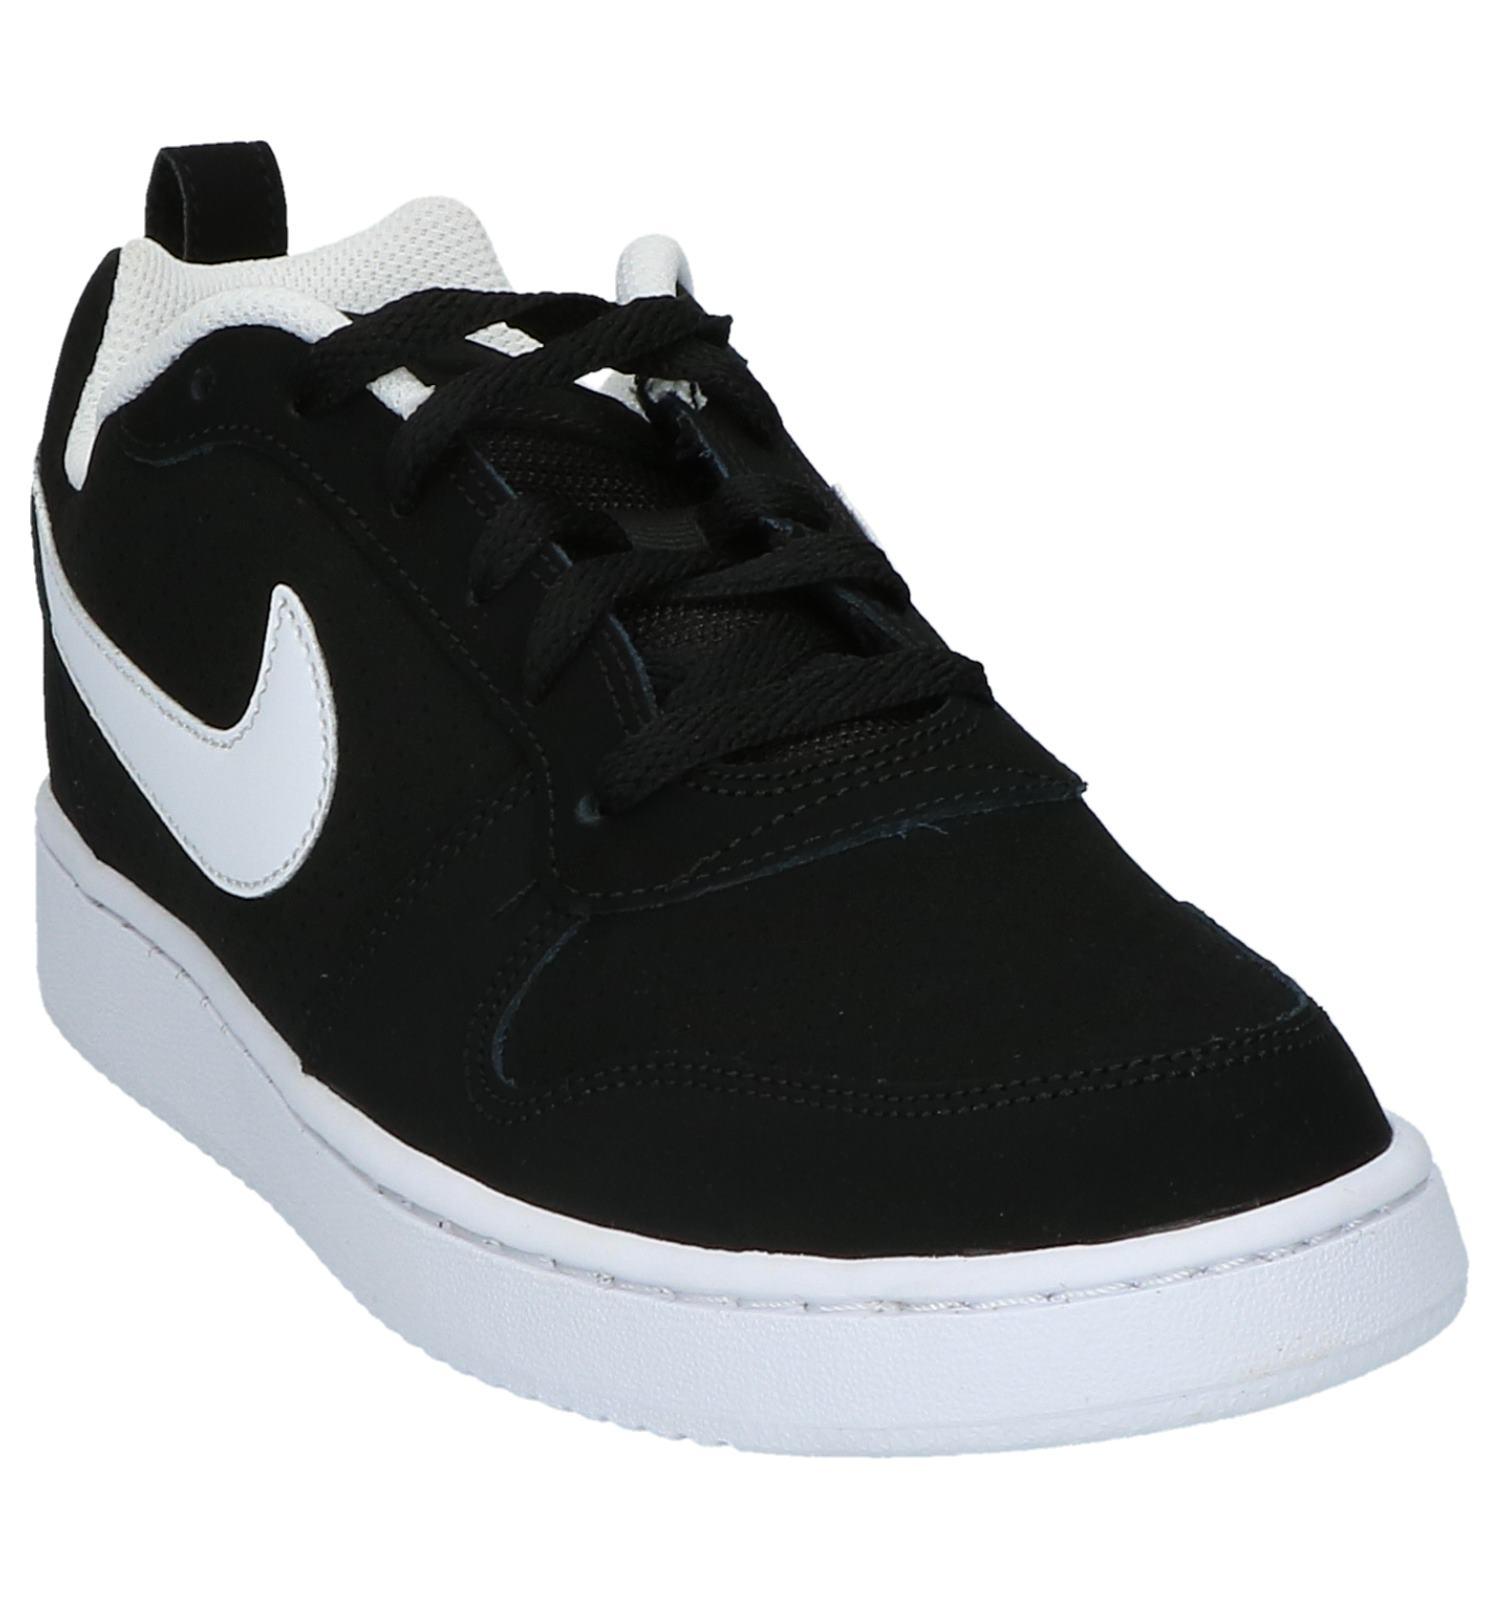 watch 04beb e4b00 Sneakers Laag Sportief Zwart Nike Court Borough Low  TORFS.BE  Gratis  verzend en retour